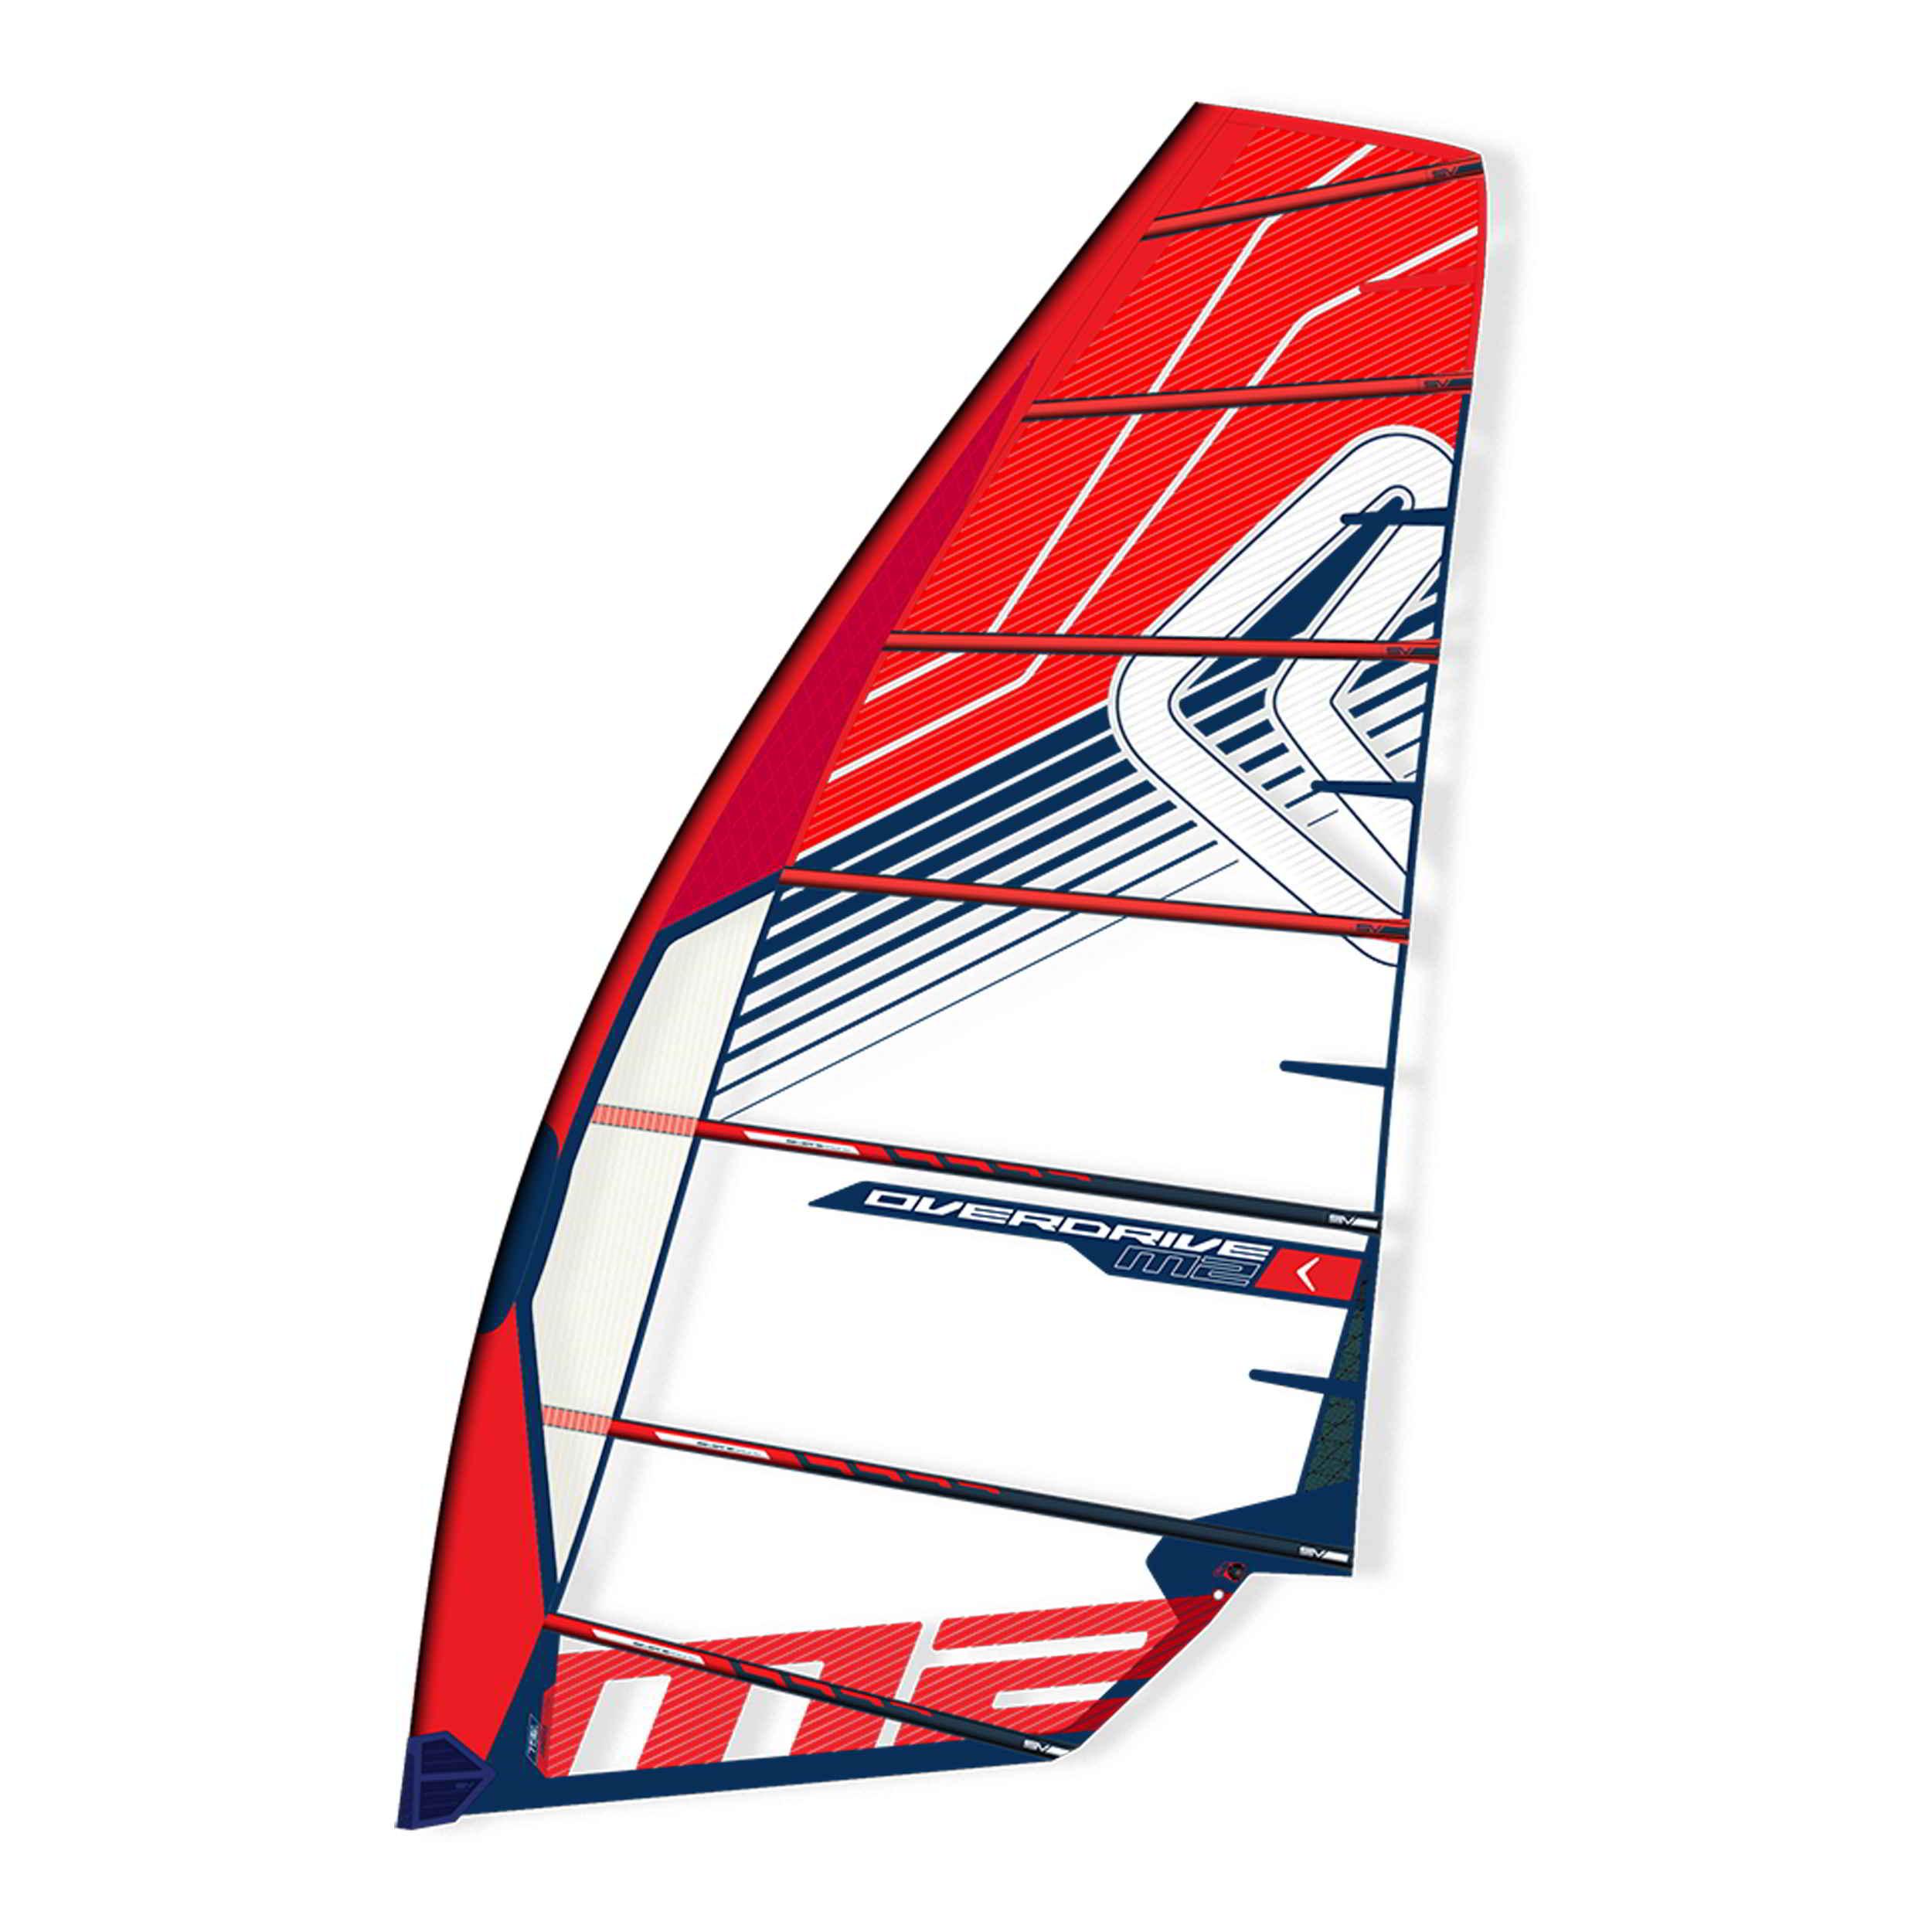 Vela de windsurf Severne Overdrive M2 2019